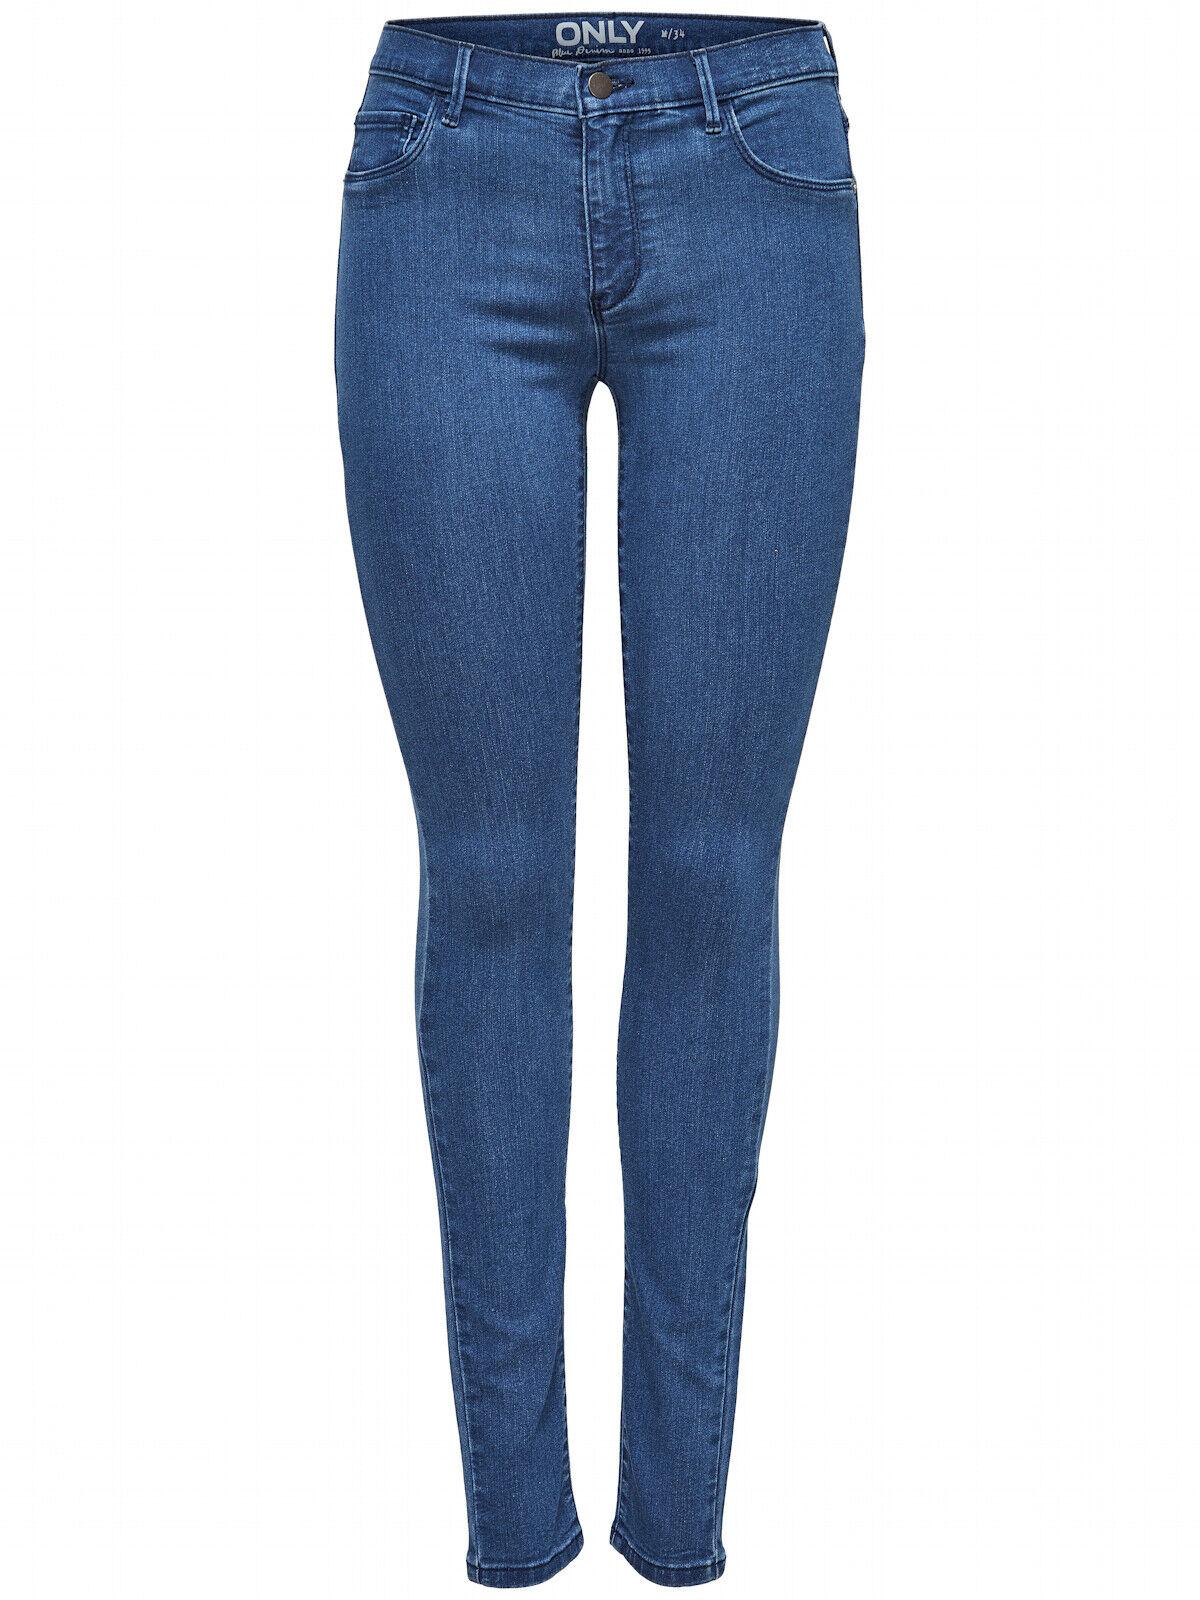 Only Damen Hose onlRain Skinny Jeanshose Hüftjeans Damenjeans Röhrenjeans blue